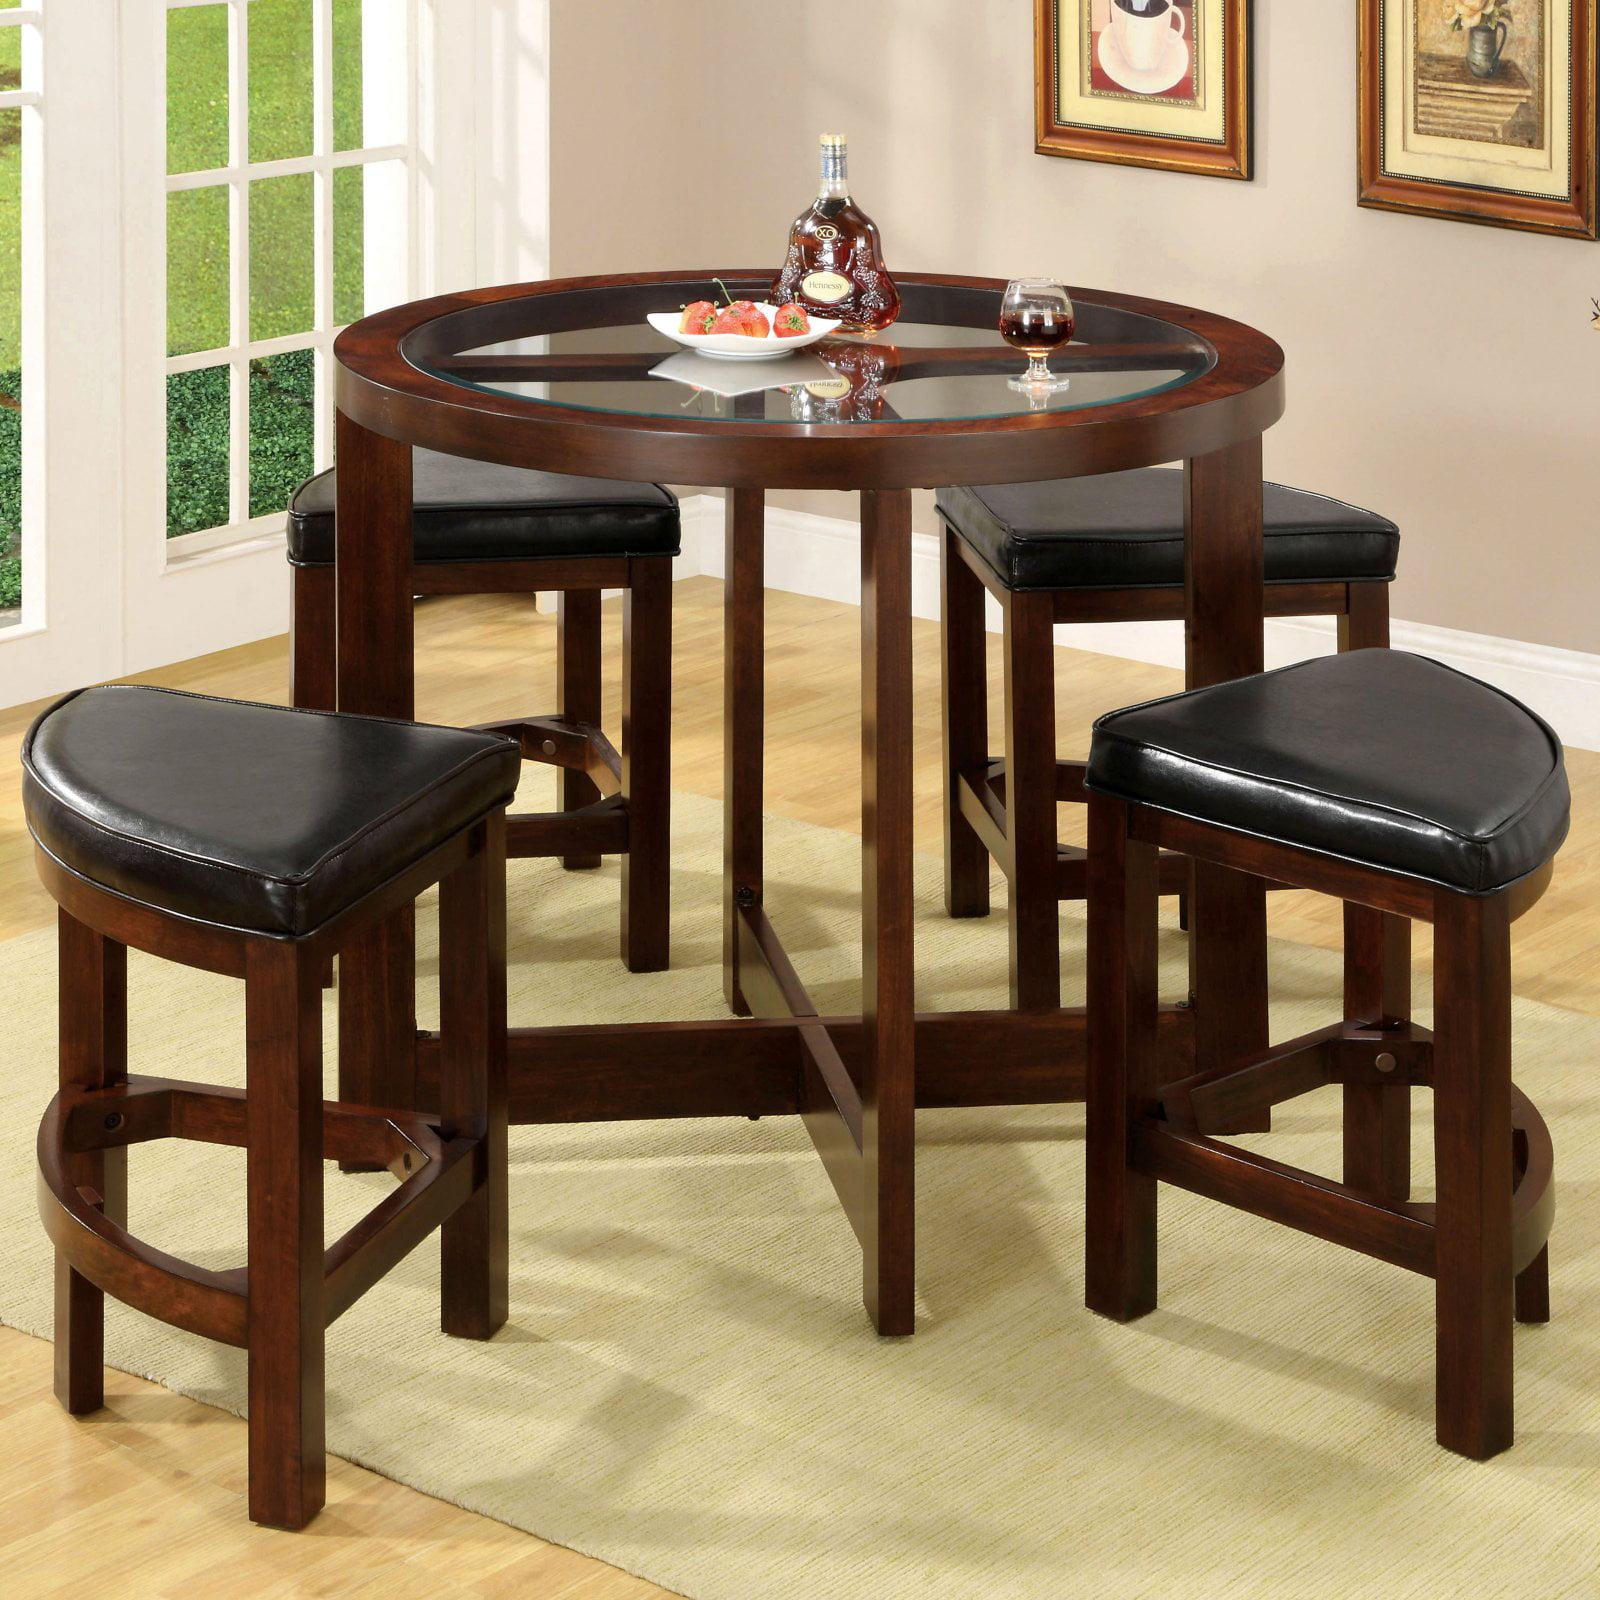 Furniture of America Corellia 5 Piece Counter Height Table Set